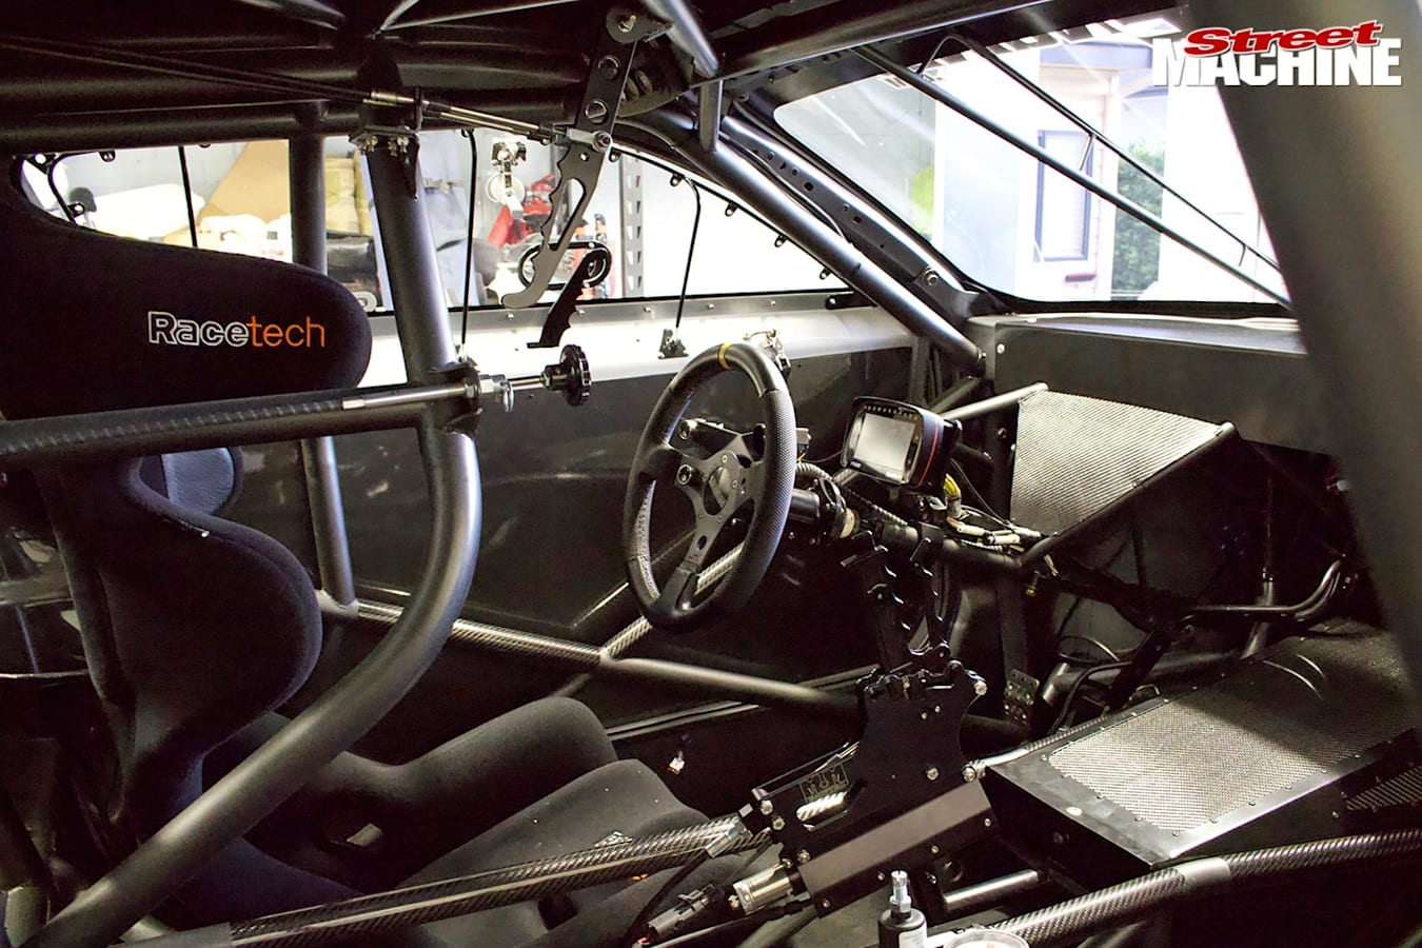 Joe Gauci's Ford Mustang interior